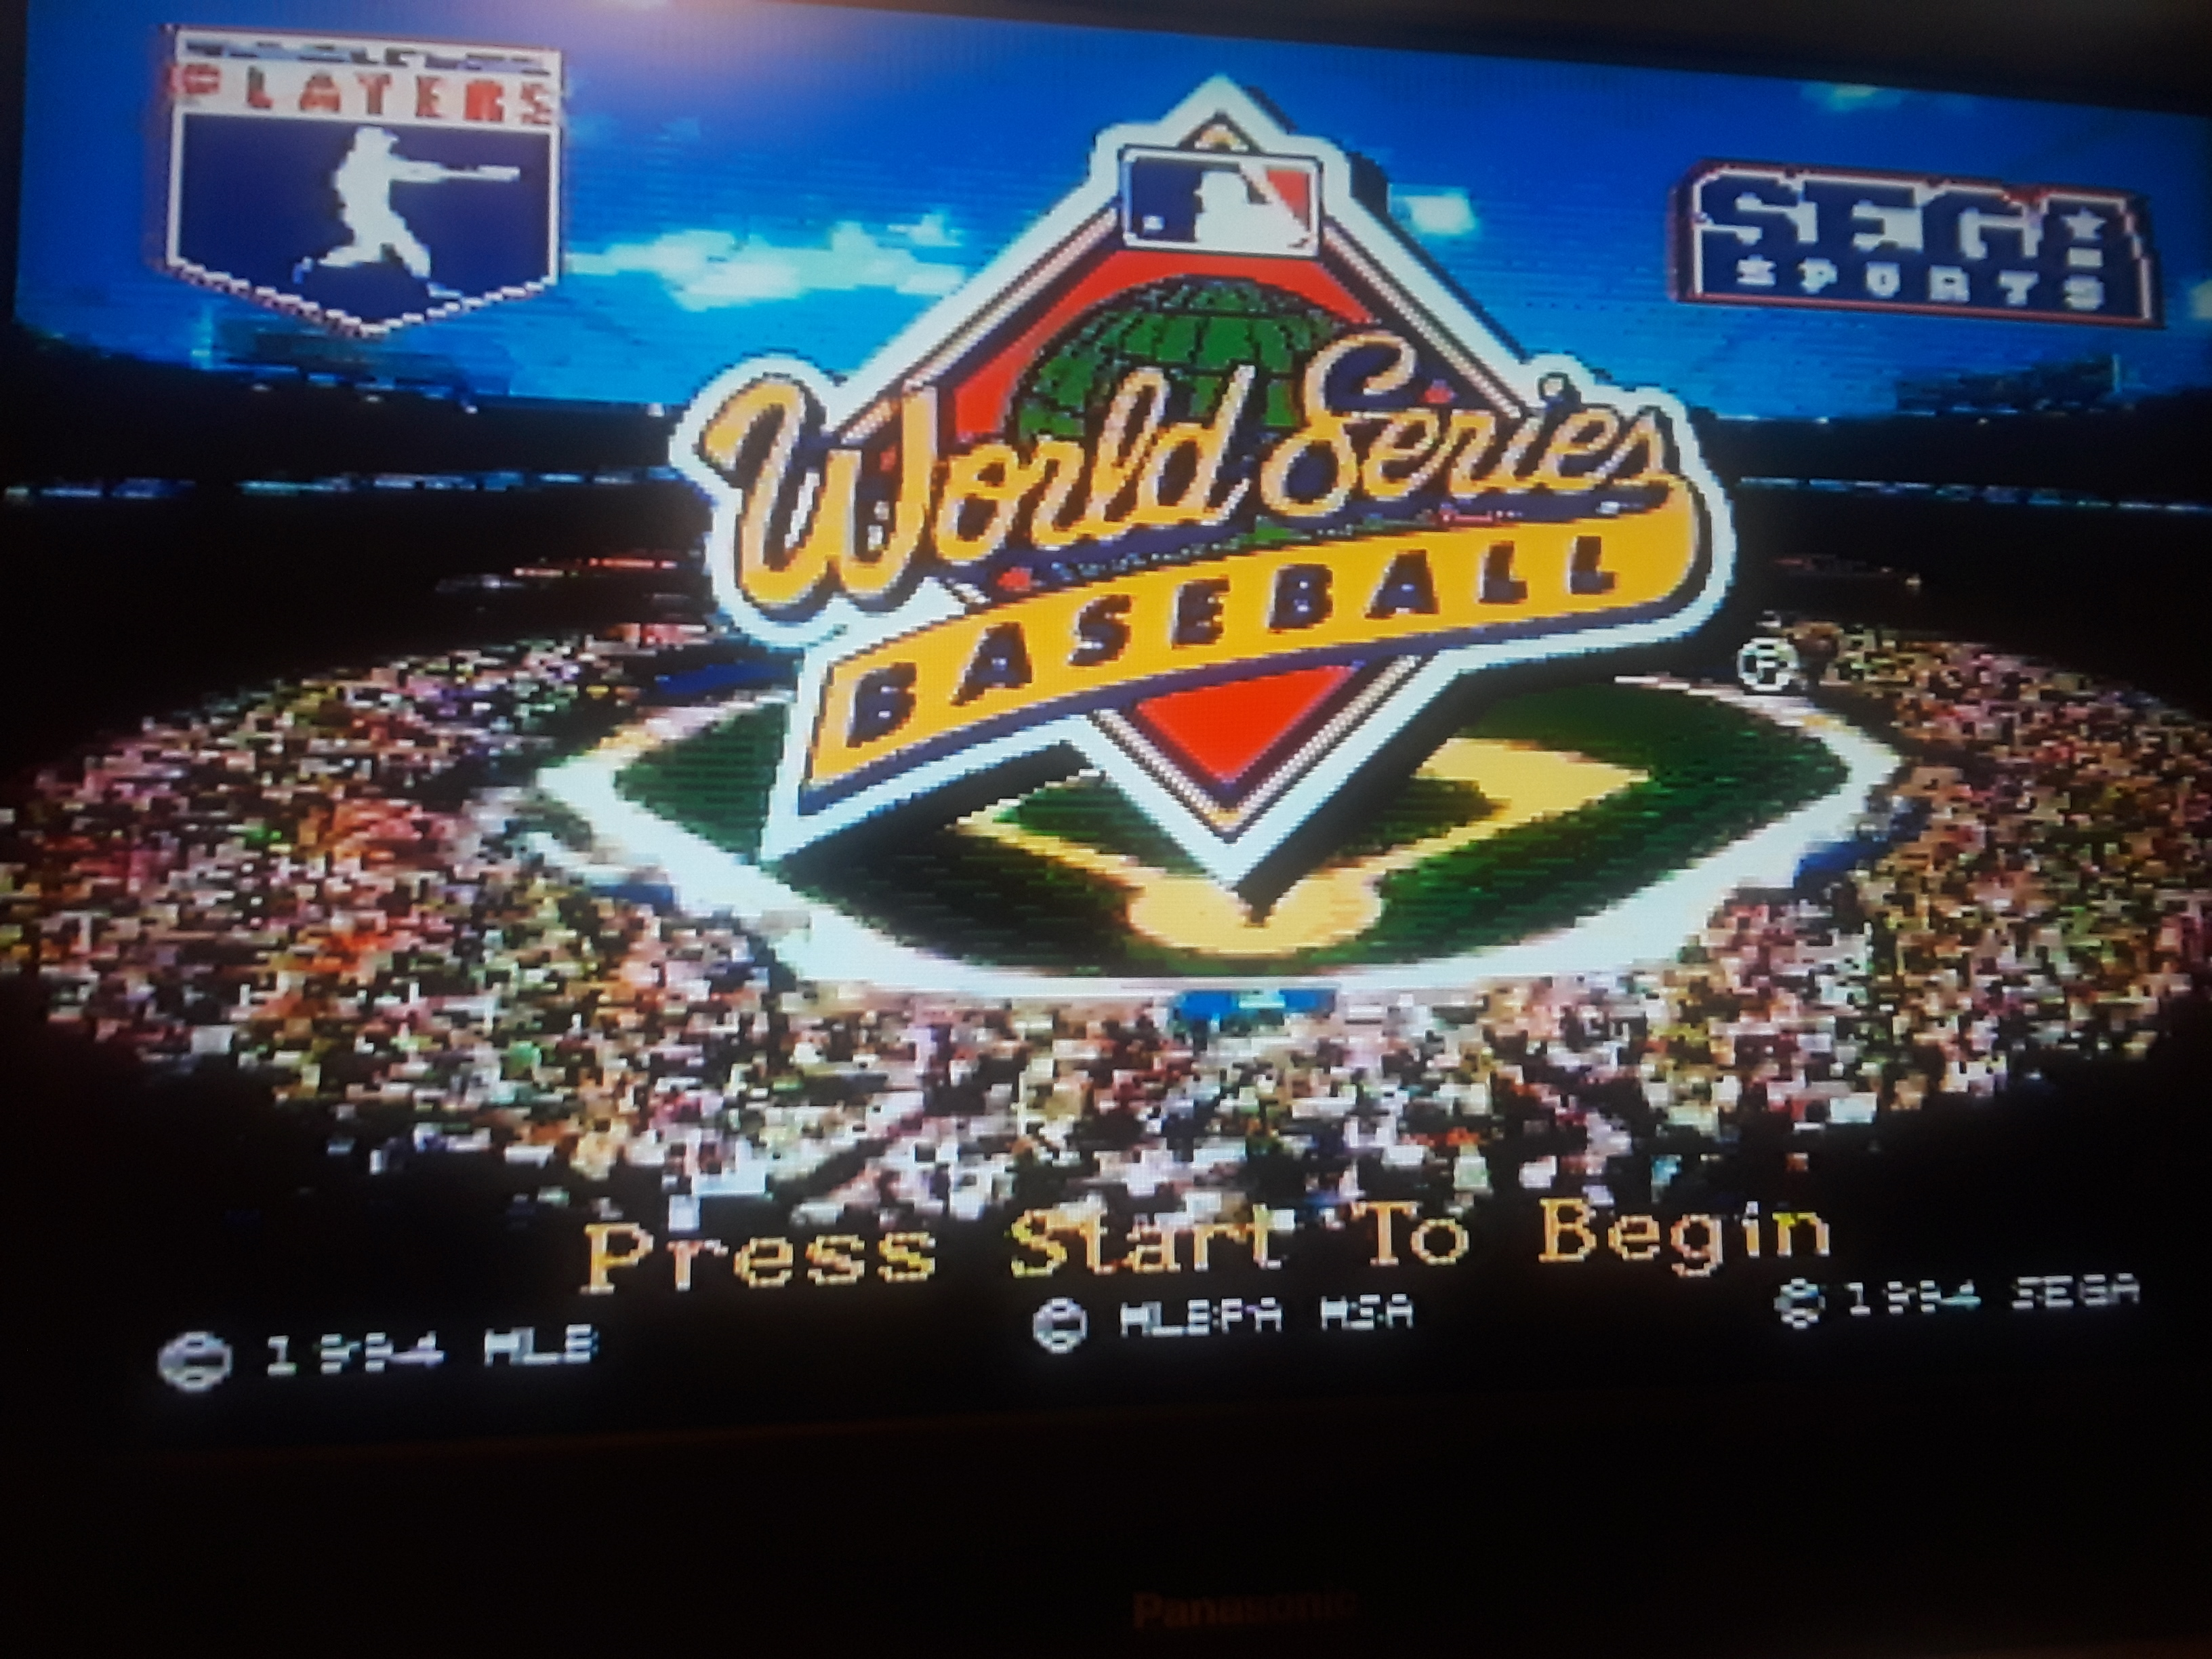 World Series Baseball: Home Run Derby [Longest Home Run in Feet] 489 points